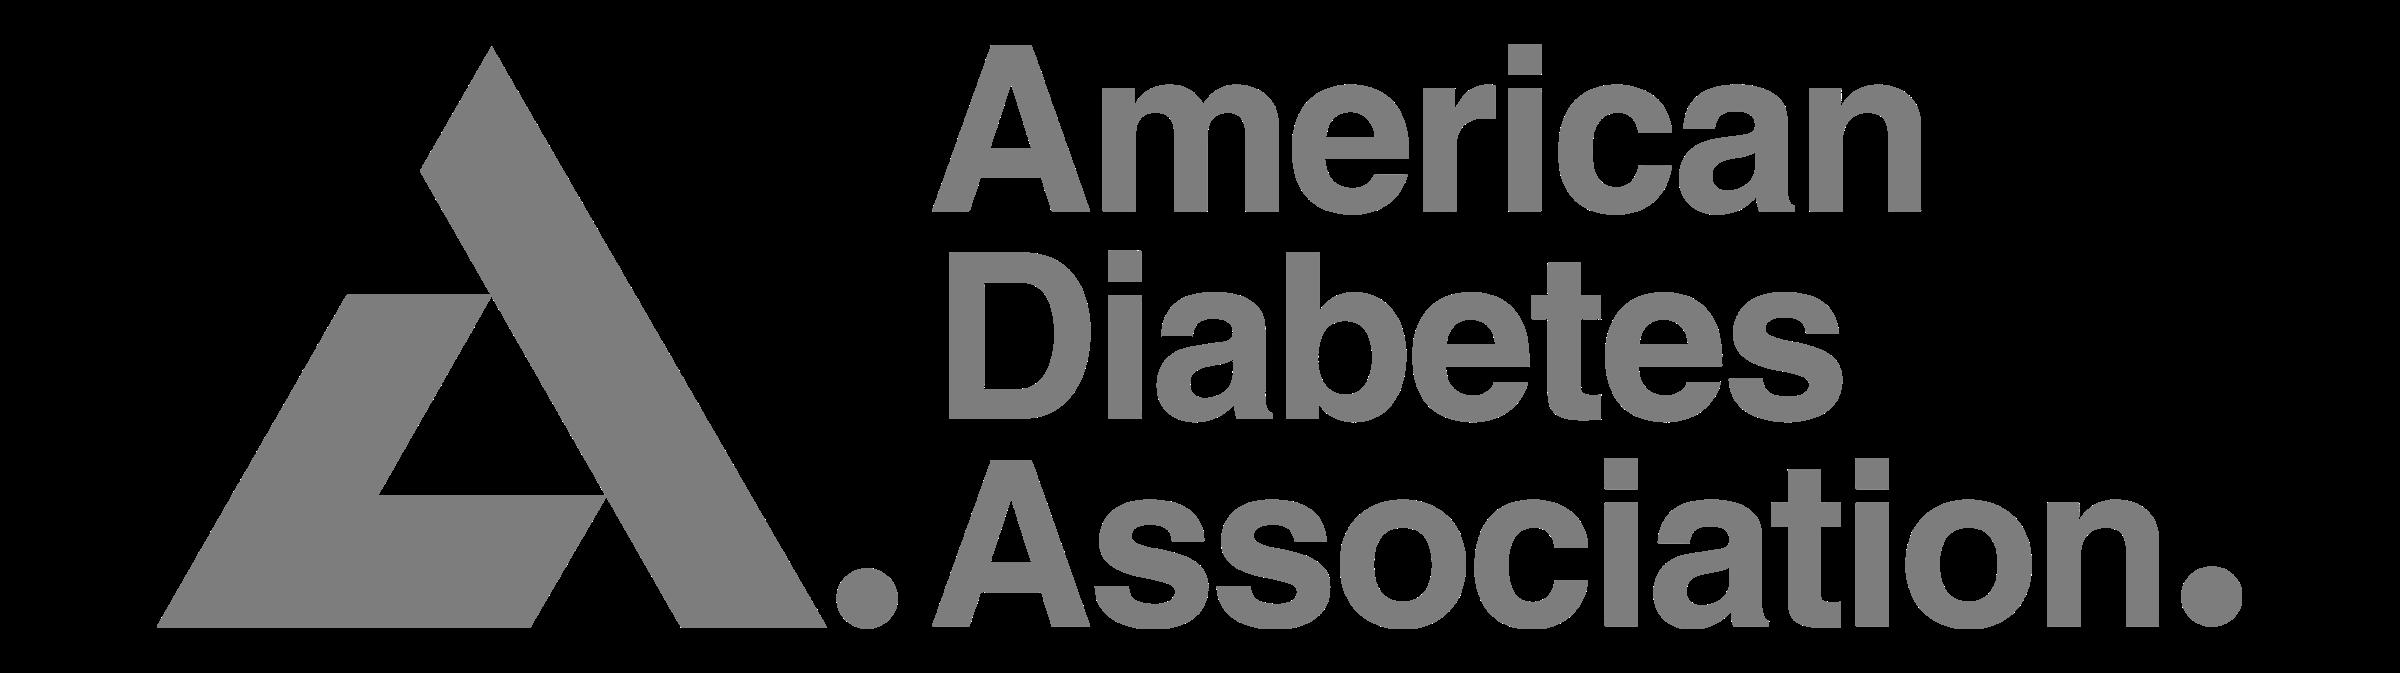 american-diabetes-association-png